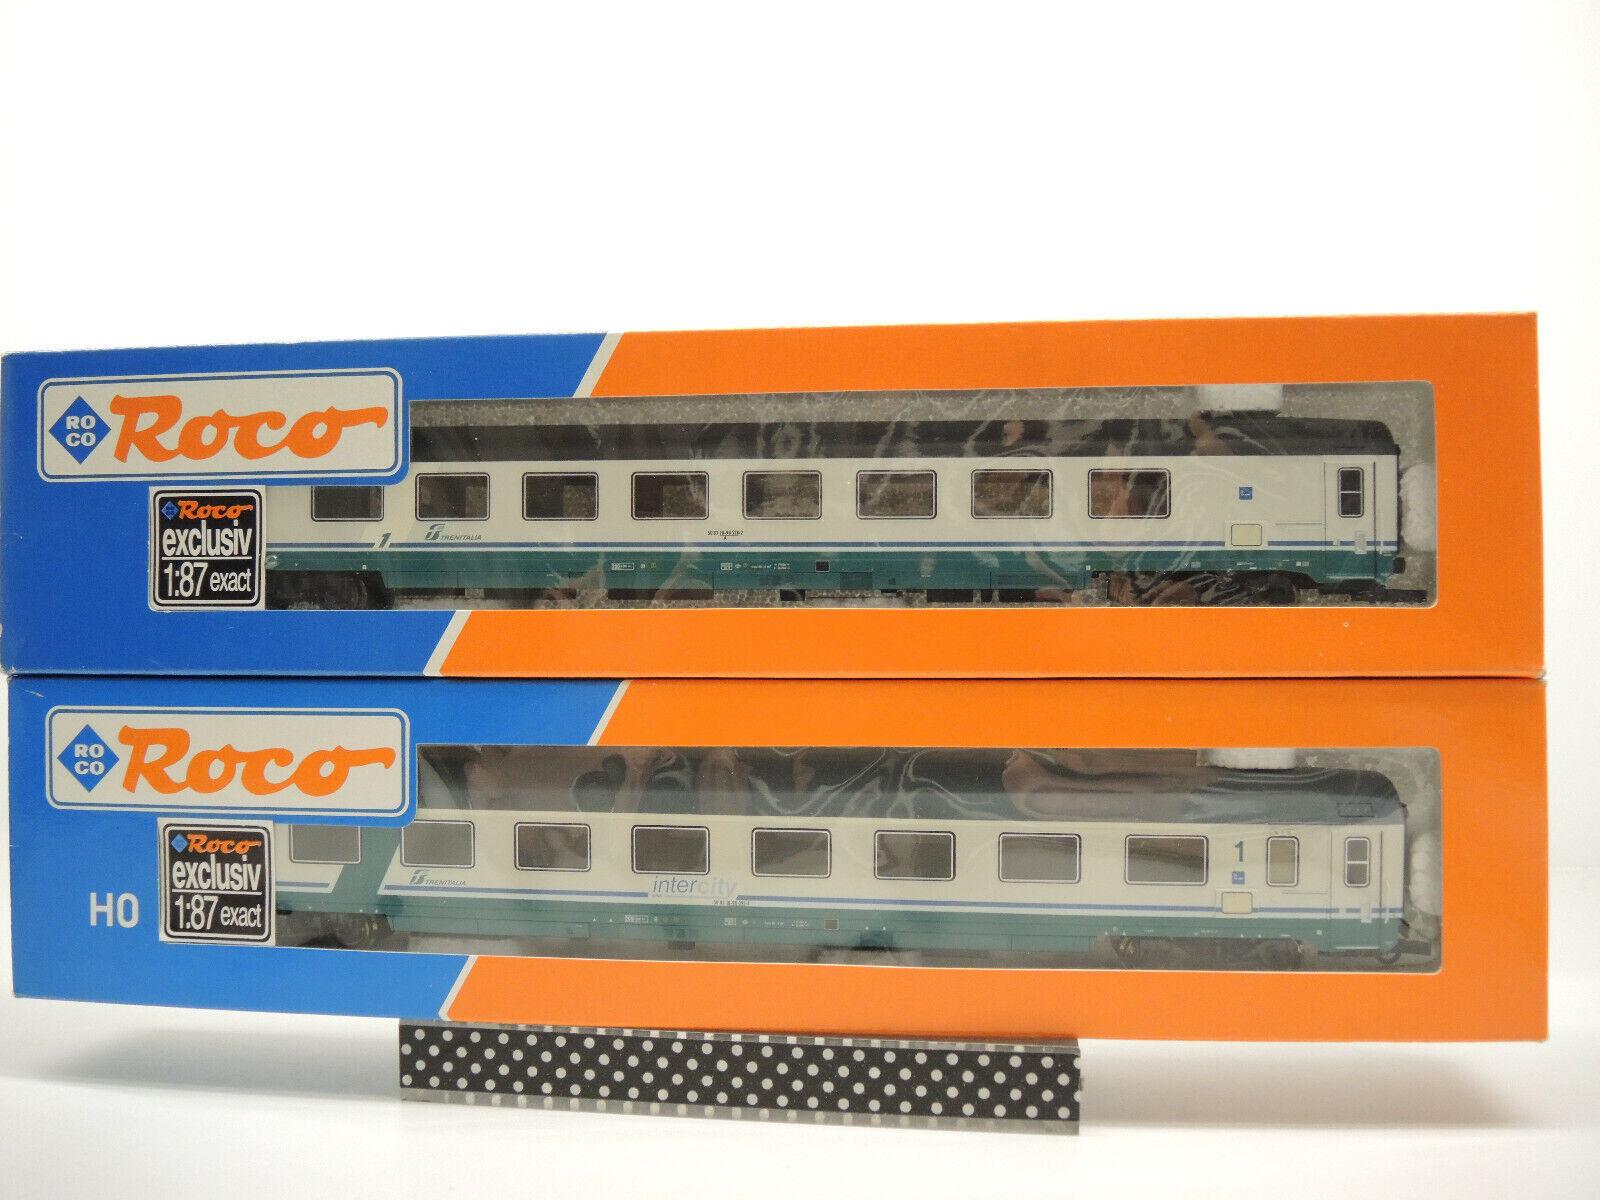 Roco 45431 45639. 2 x Trenitalia InterCity a los turismos kkk OVP leer texto